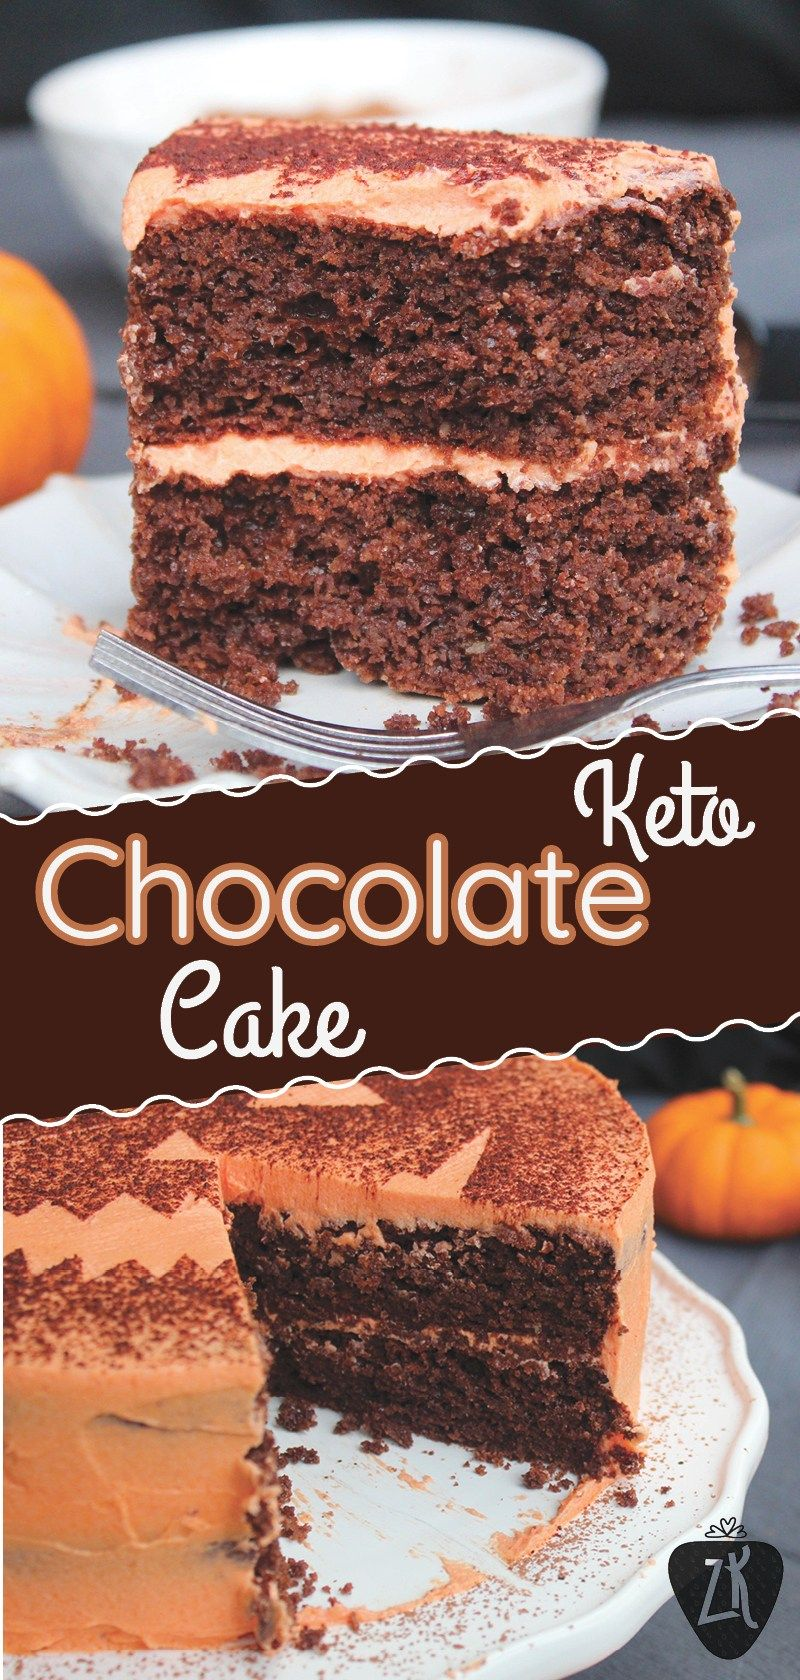 Best keto chocolate cake recipe keto chocolate cake